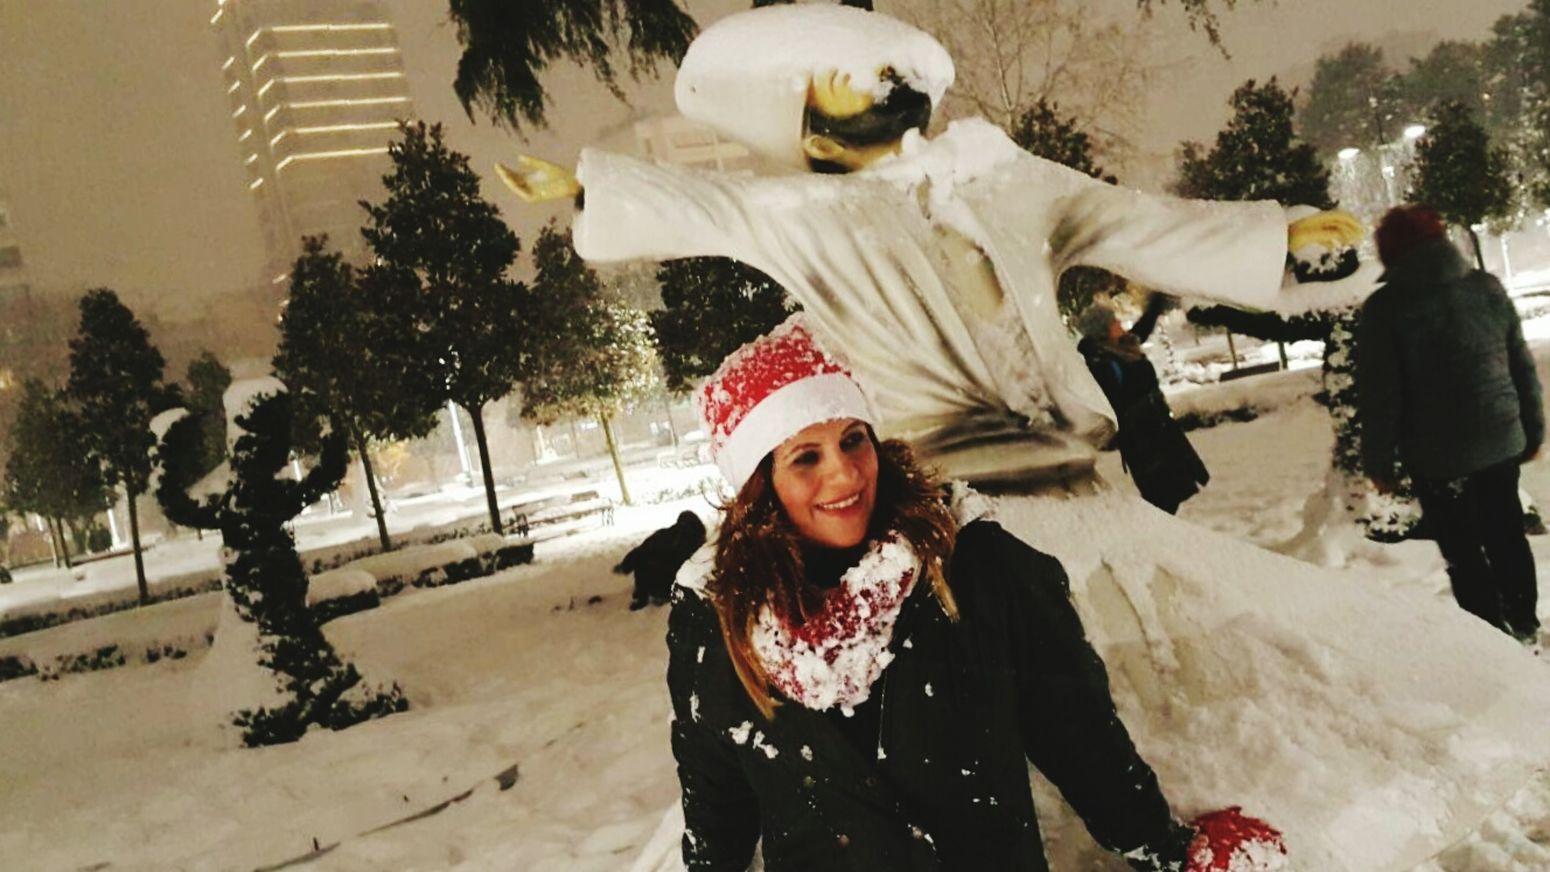 Soğuk mu ne?!!! Snow ❄ A Snowy Day Christmastime Taking Photos That's Me Enjoying Life Göztepeparkı Karlı Güne Merhaba :)) Cold Winter ❄⛄ Coldweather New Year Tipitip Noel Anne Showcase: January ıt's Cold Outside ıt's Cold Outside ıt's Snowing Soğuk Hava Geceyeselam